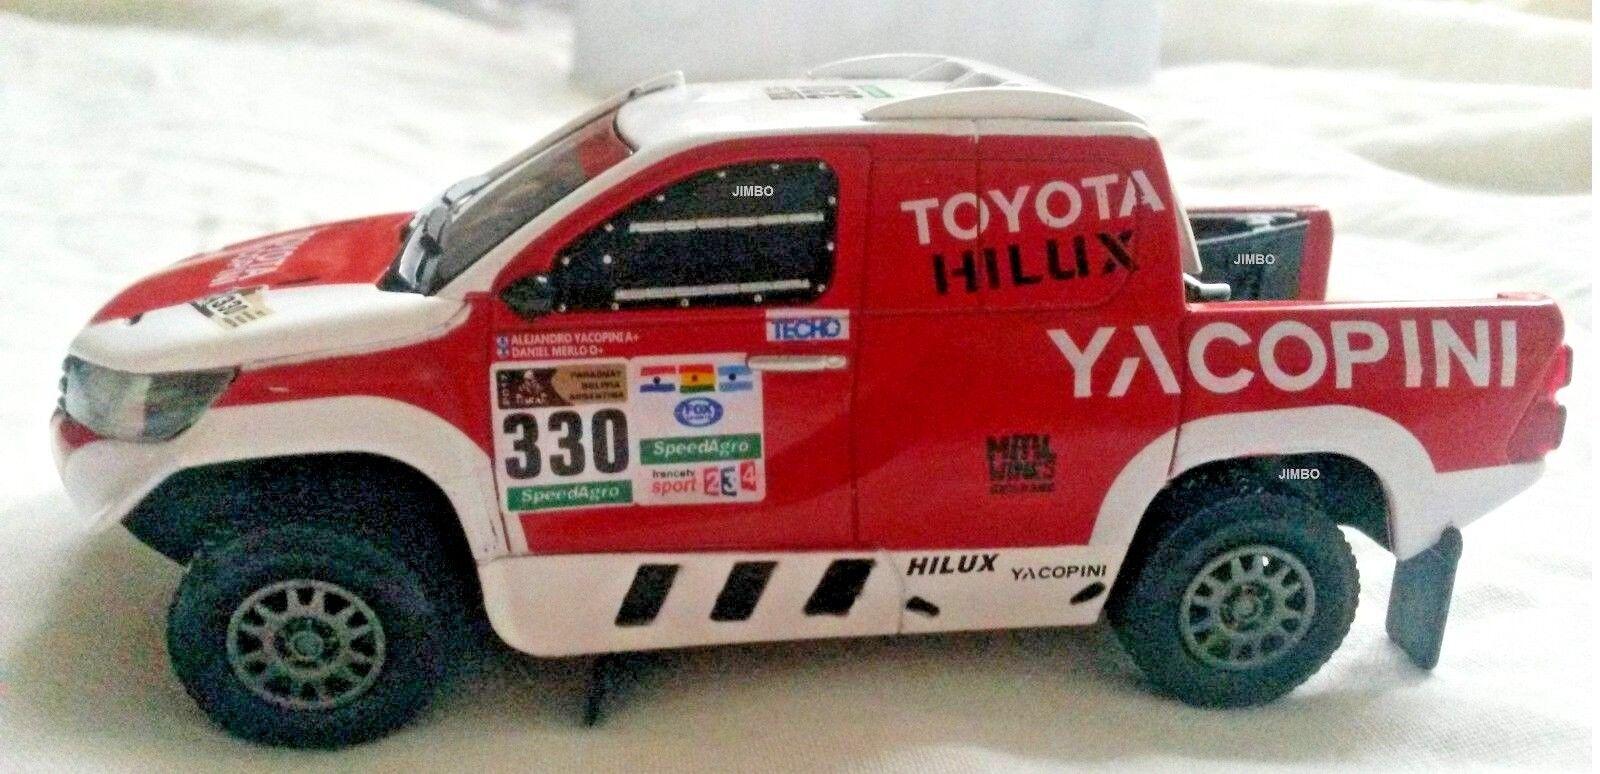 IXO - TOYOTA HILUX 1 43 RALLY DAKAR 2017 DIECAST, METAL, NEW IN BOX.